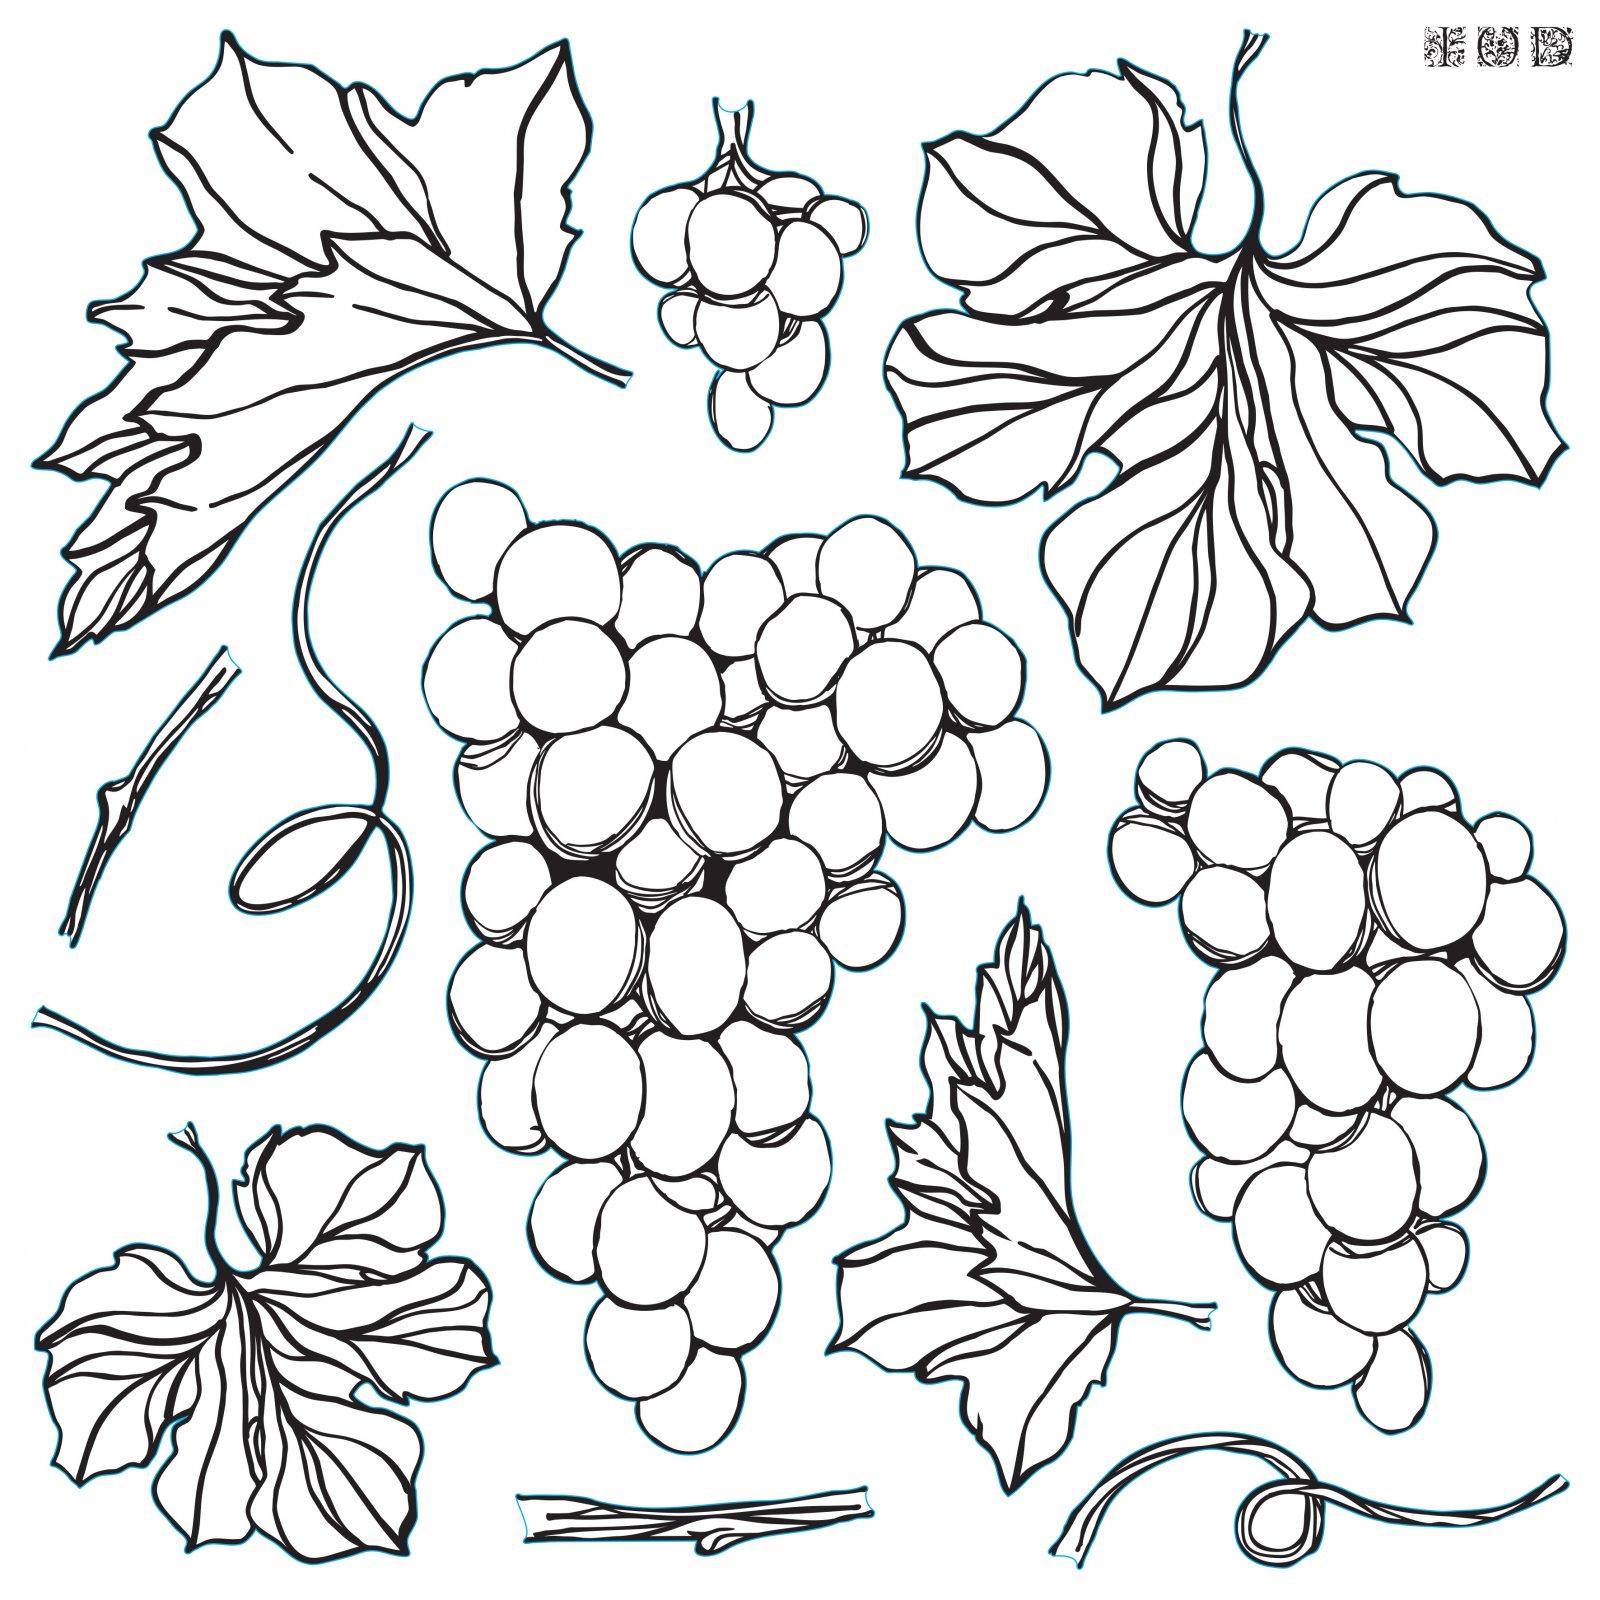 Grapes 12x12 IOD Stamp